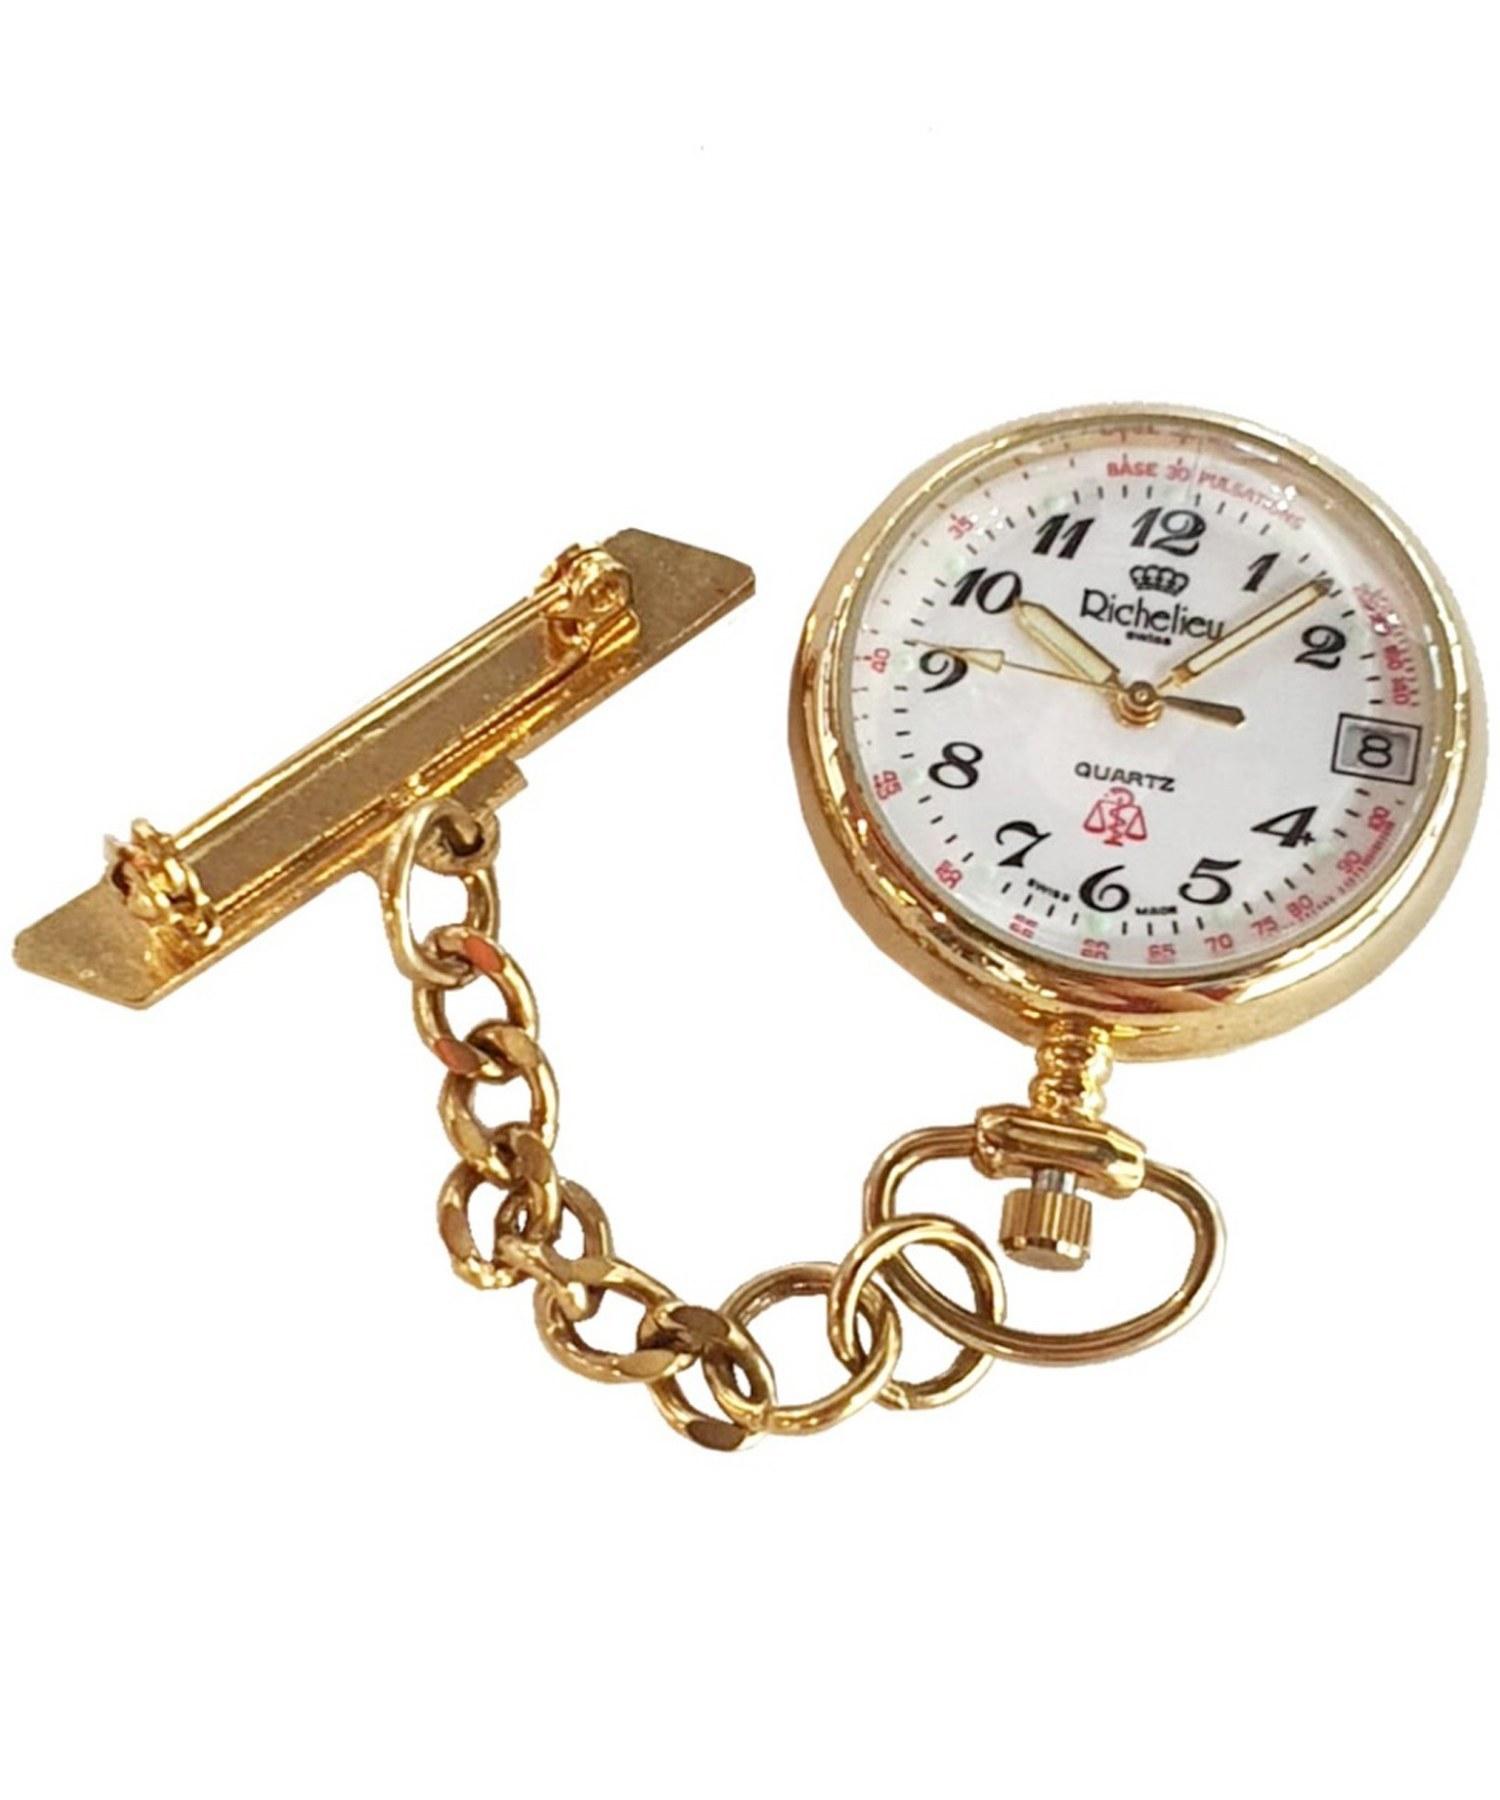 تصویر ساعت جیبی مردانه و زنانه ریچلیو ، کد 100505915